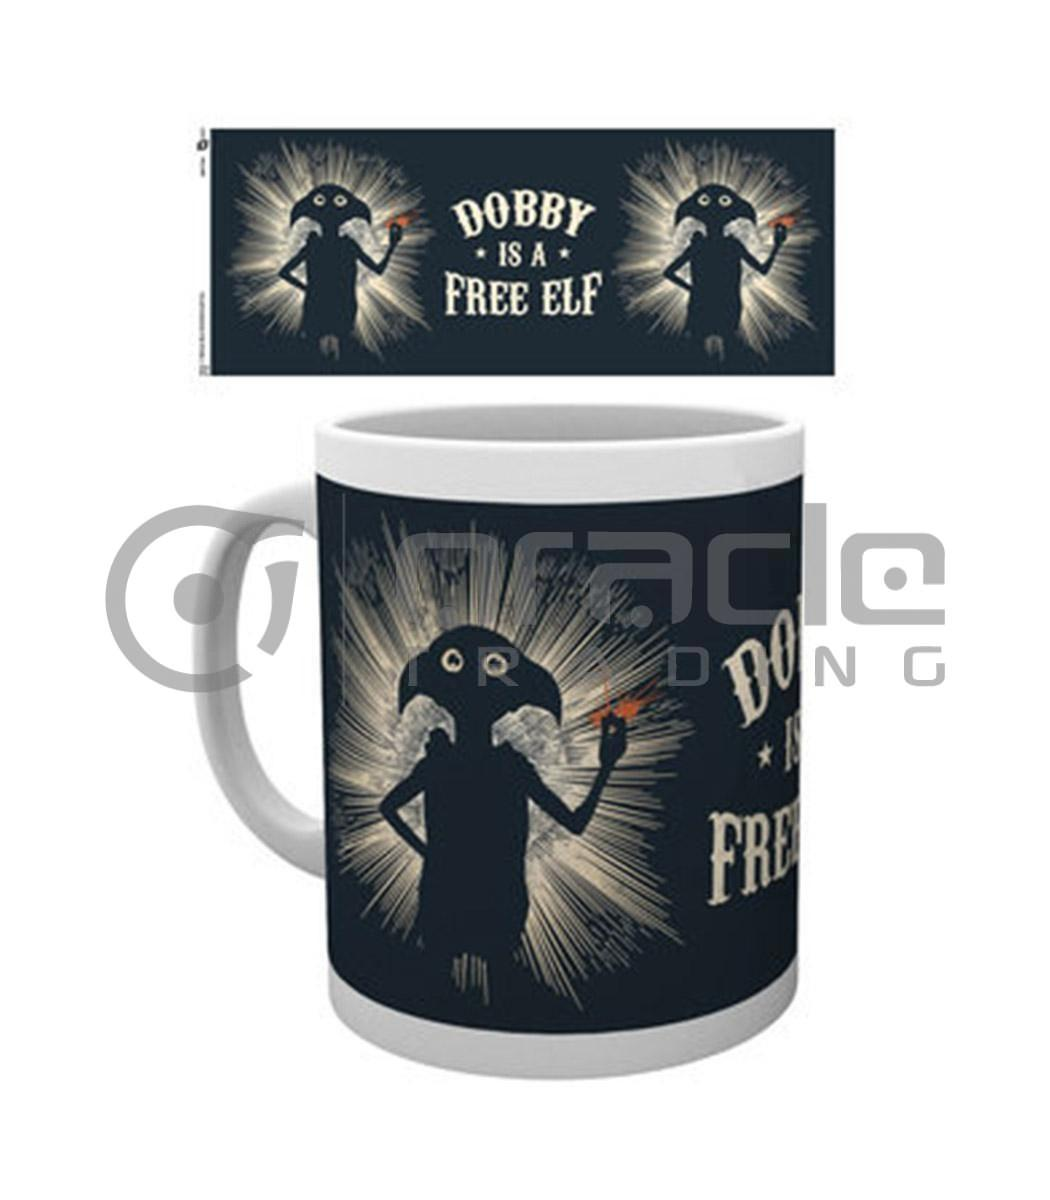 Harry Potter Dobby Mug (Free Elf)